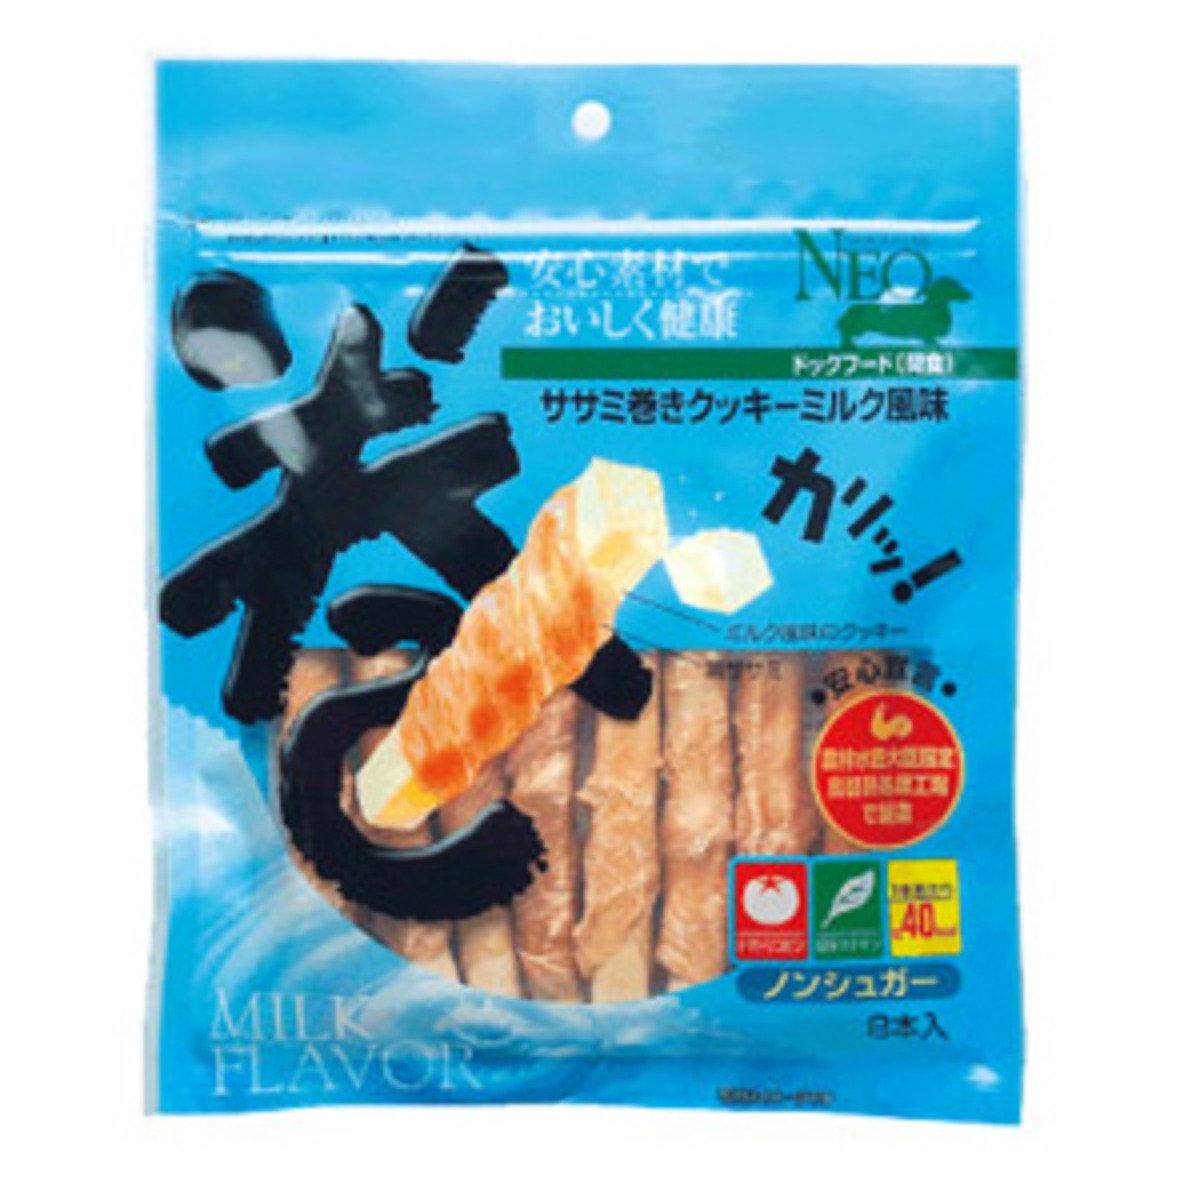 NEO 雞胸肉卷餅乾- 牛奶風味 8枝